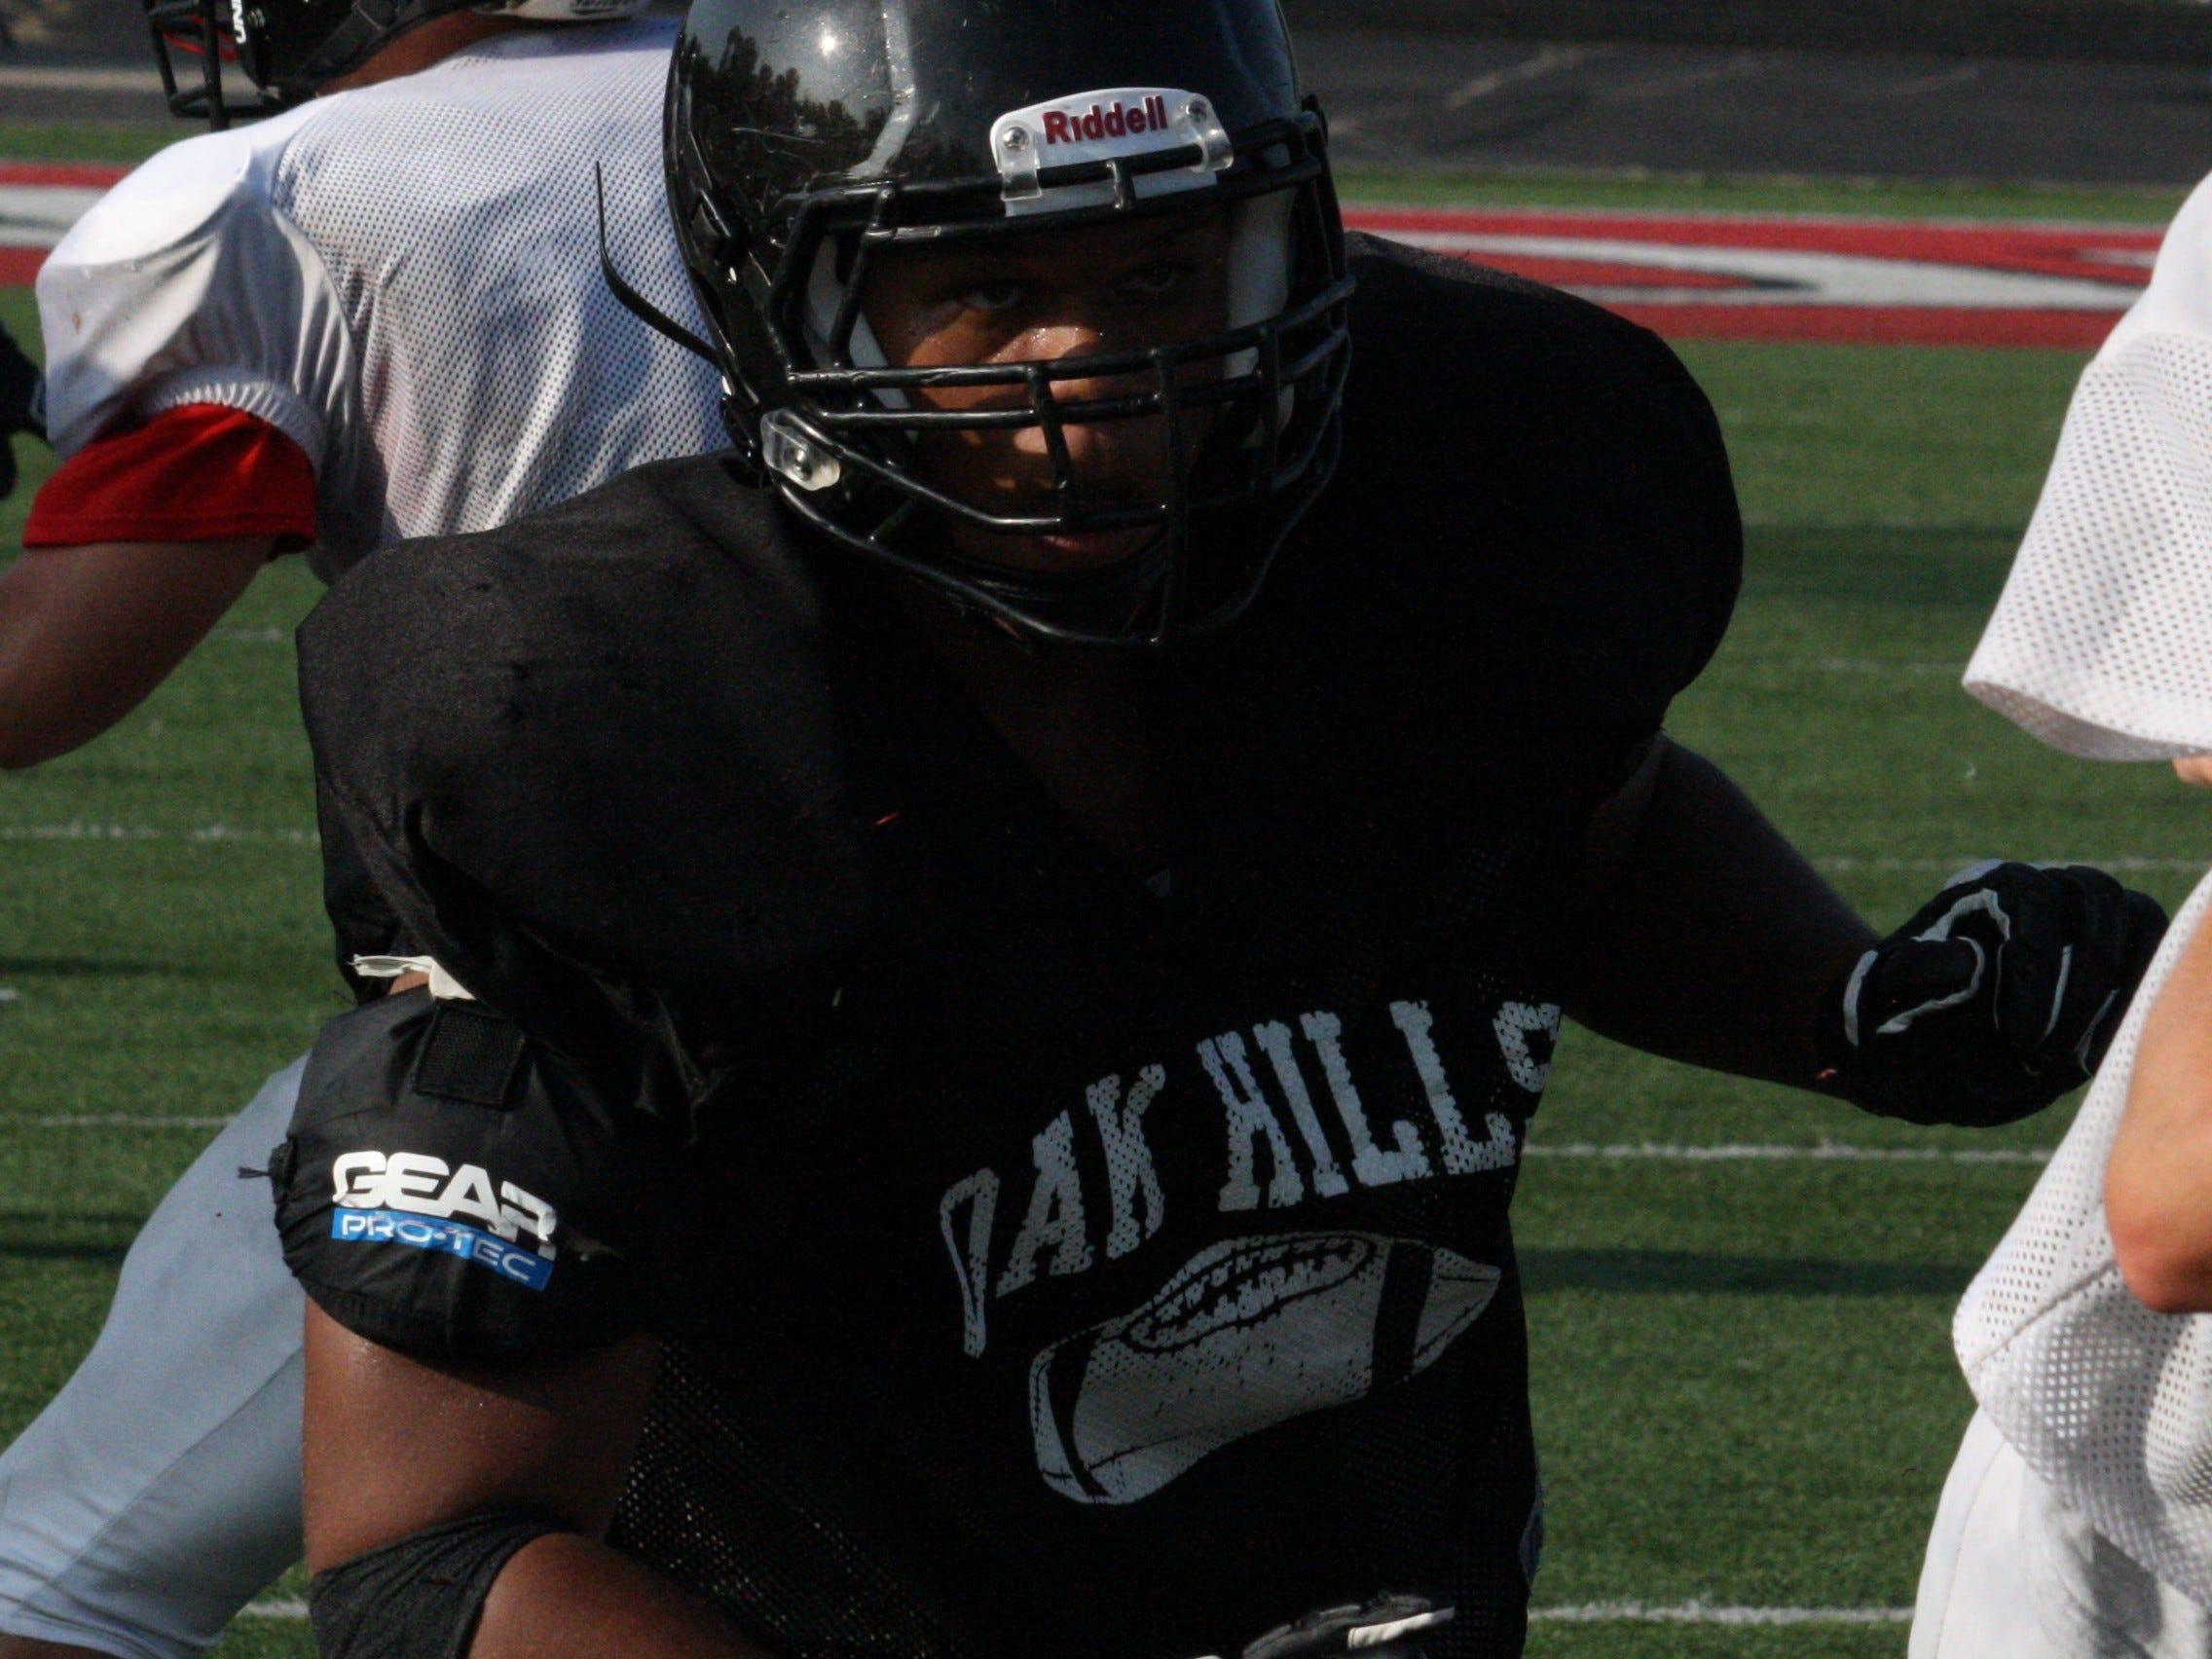 Oak Hills High School senior defensive lineman Montell Brown rushes the passer during practice Aug. 20 at Oak Hills. Brown led the team with seven sacks last season.